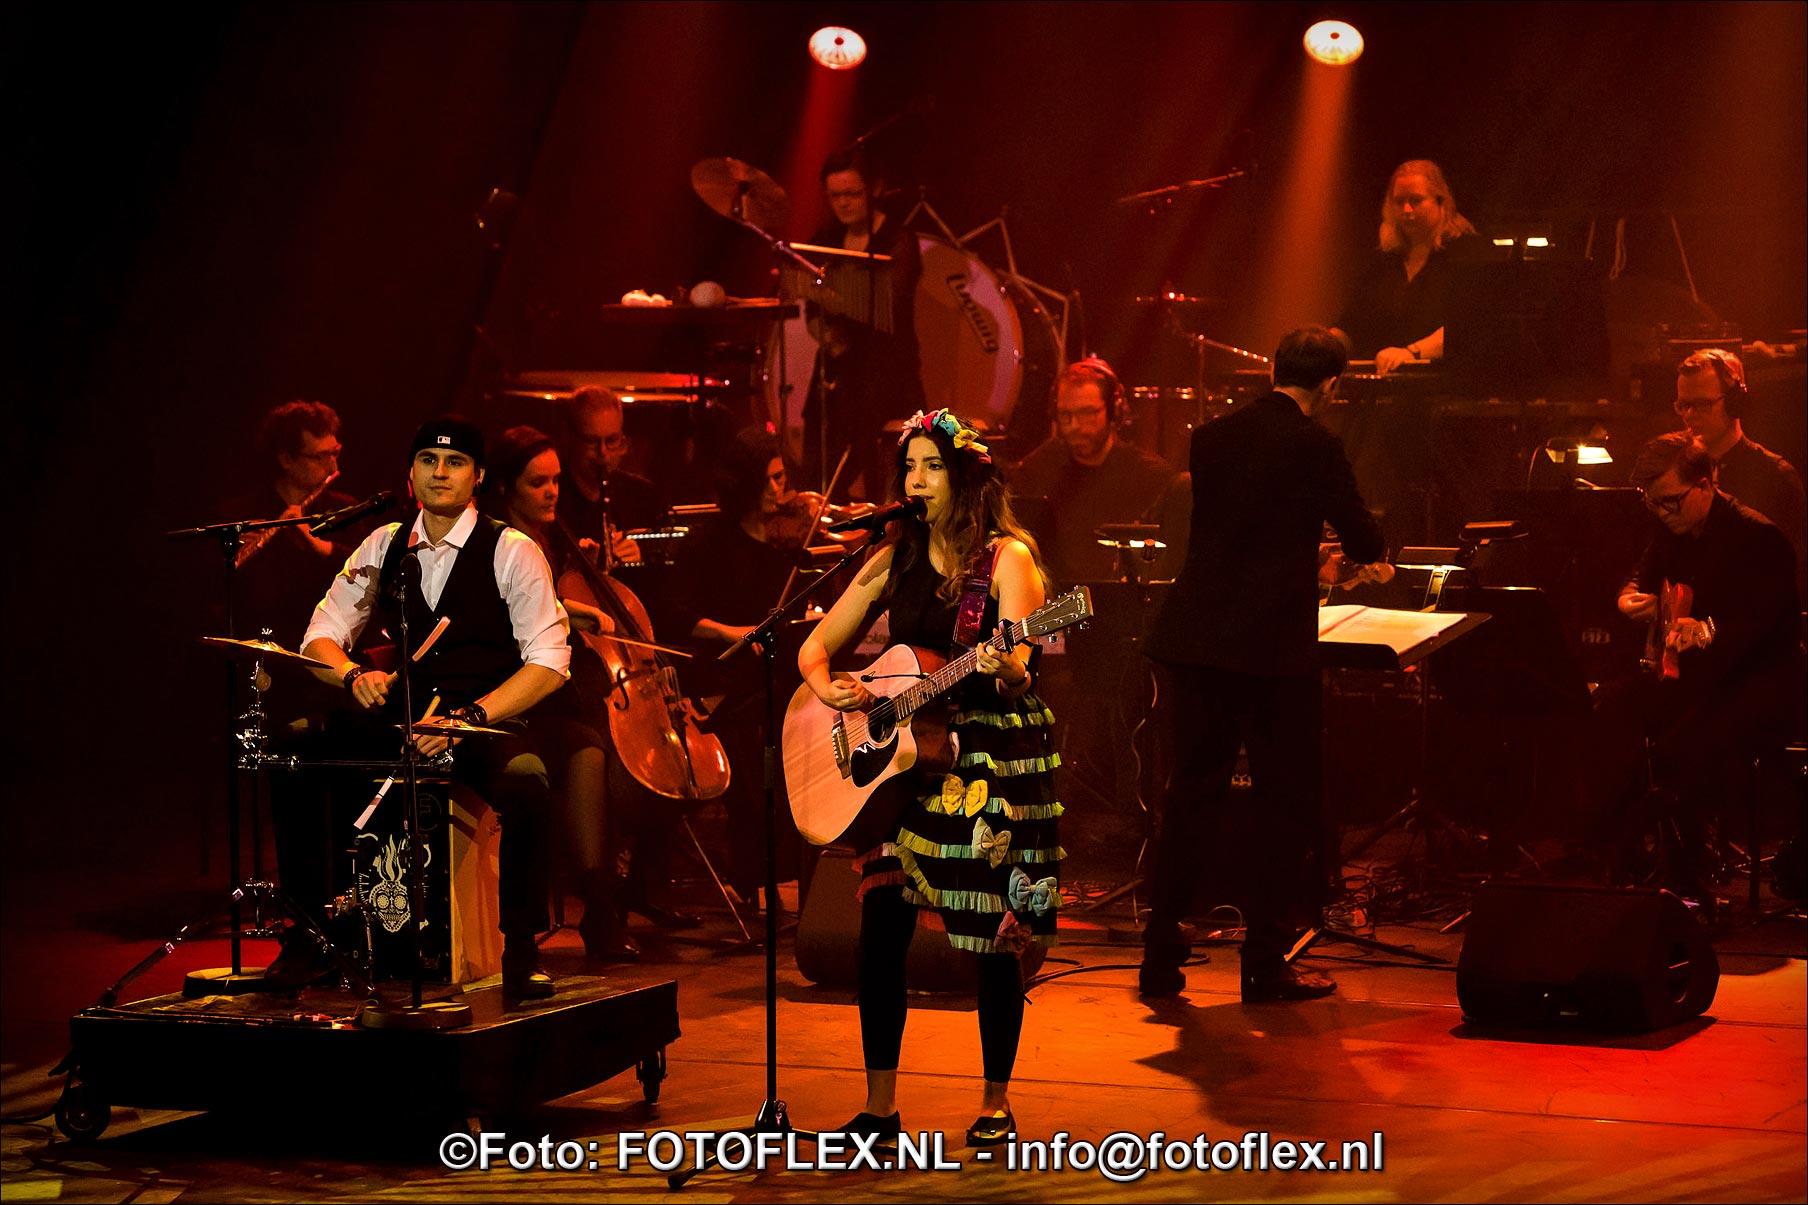 0522-CopyrightFOTOFLEX.NL07012020